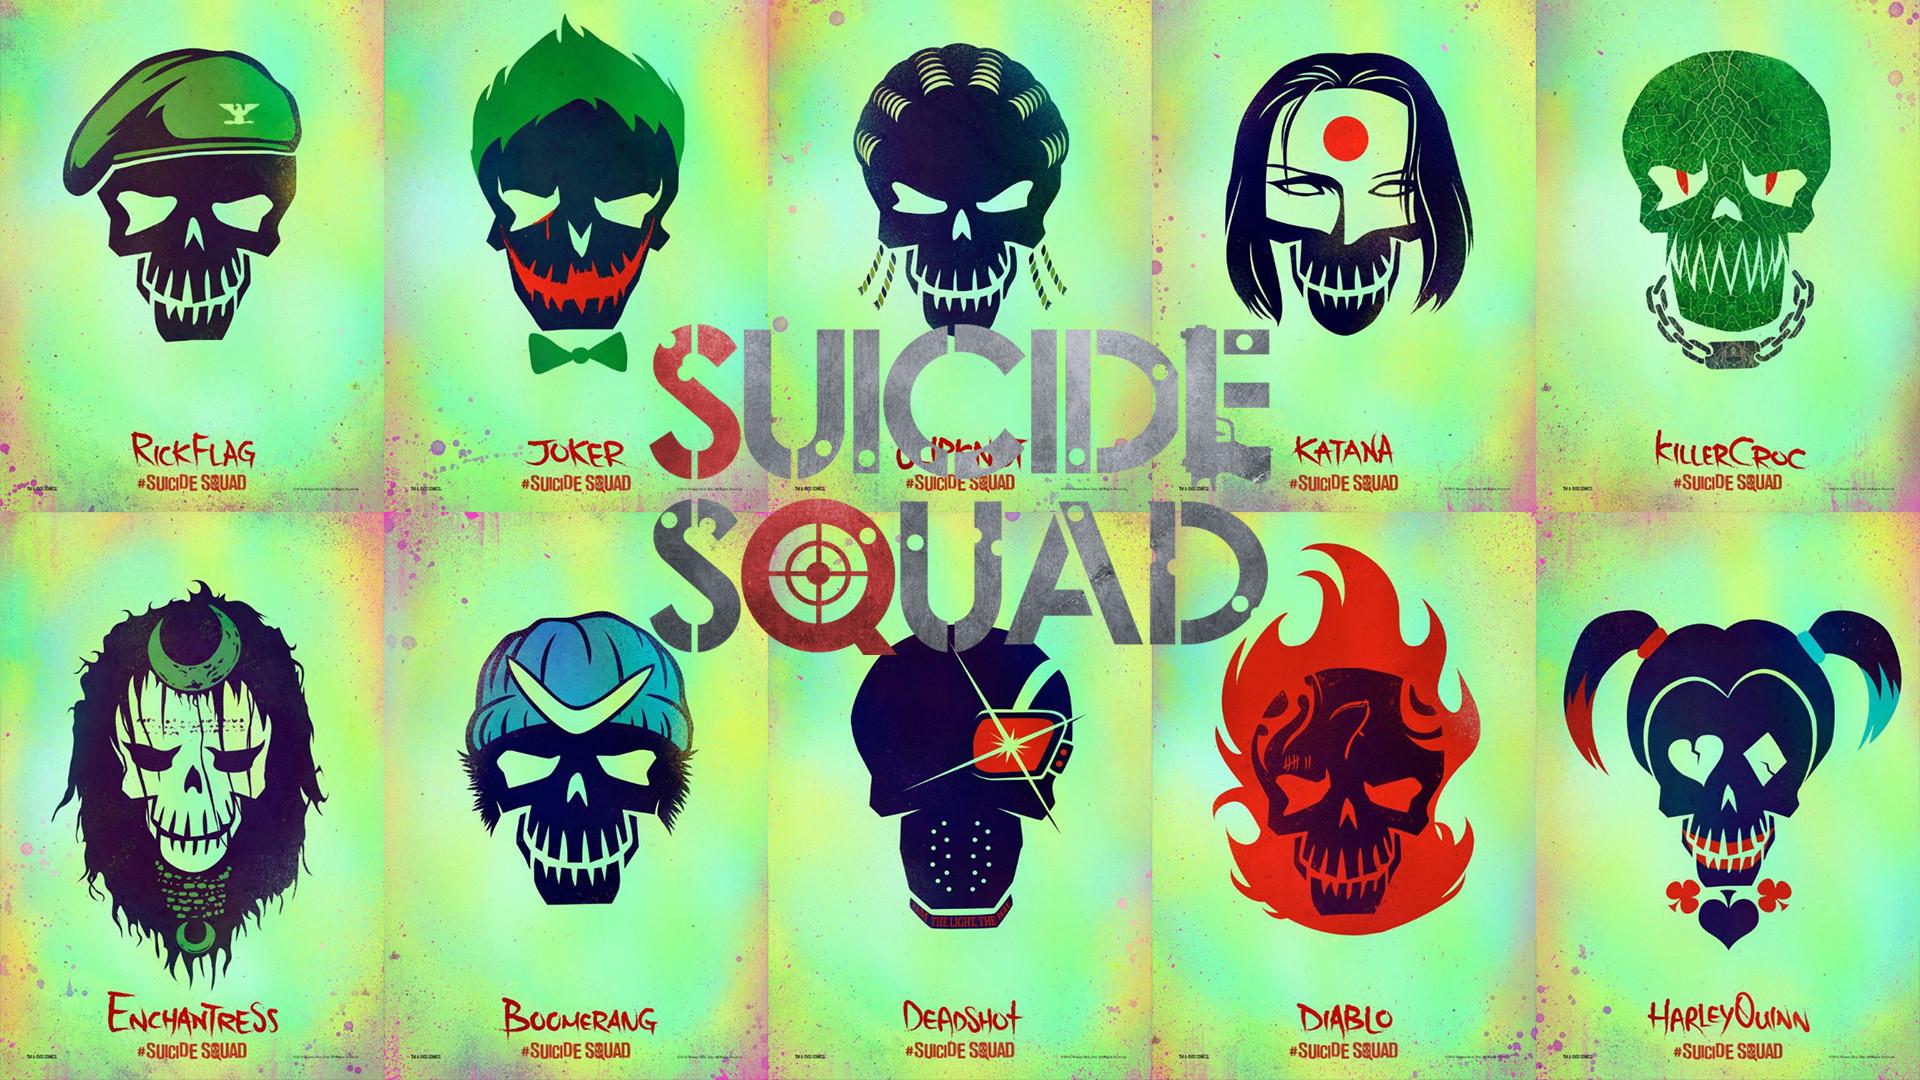 Suicide squad joker wallpaper 73 images 2560x1440 voltagebd Choice Image